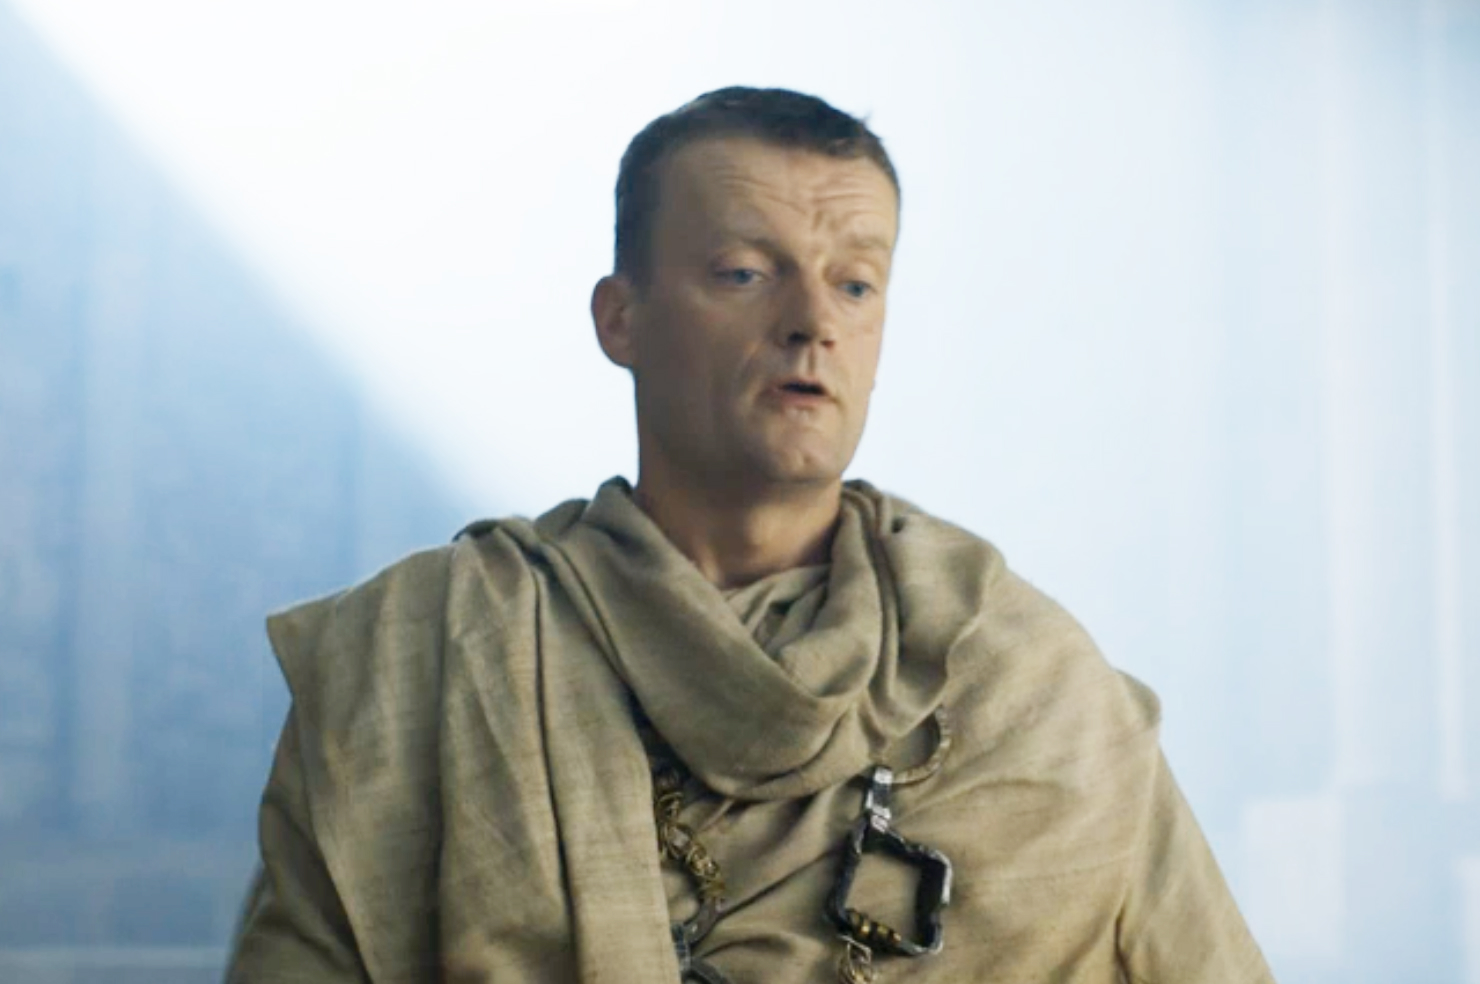 Frank Hvam Game of Thrones